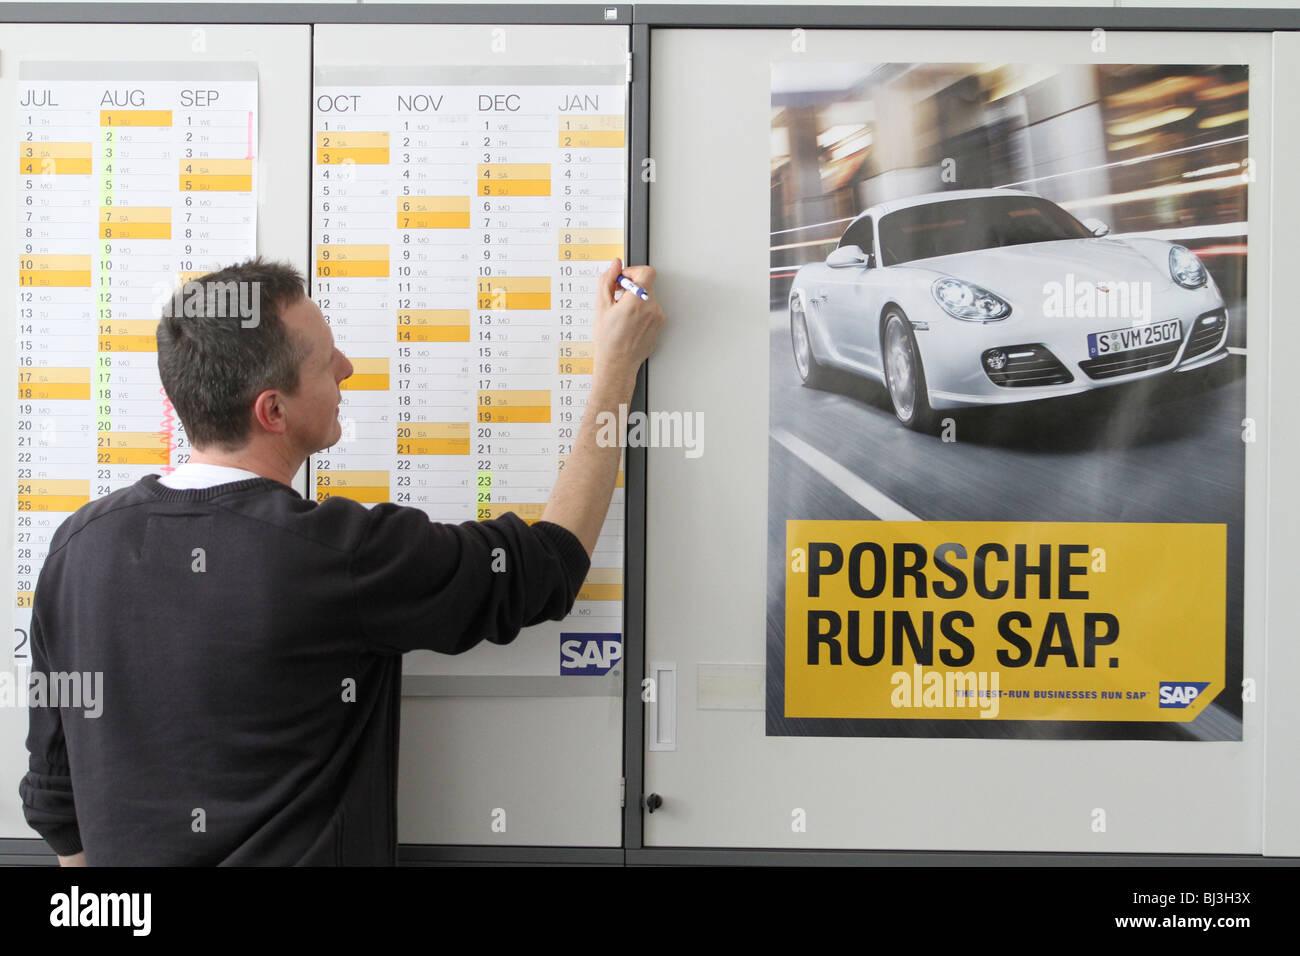 SAP headquarters, Walldorf, Germany. office, building, it-company, business software, porsche runs sap. - Stock Image